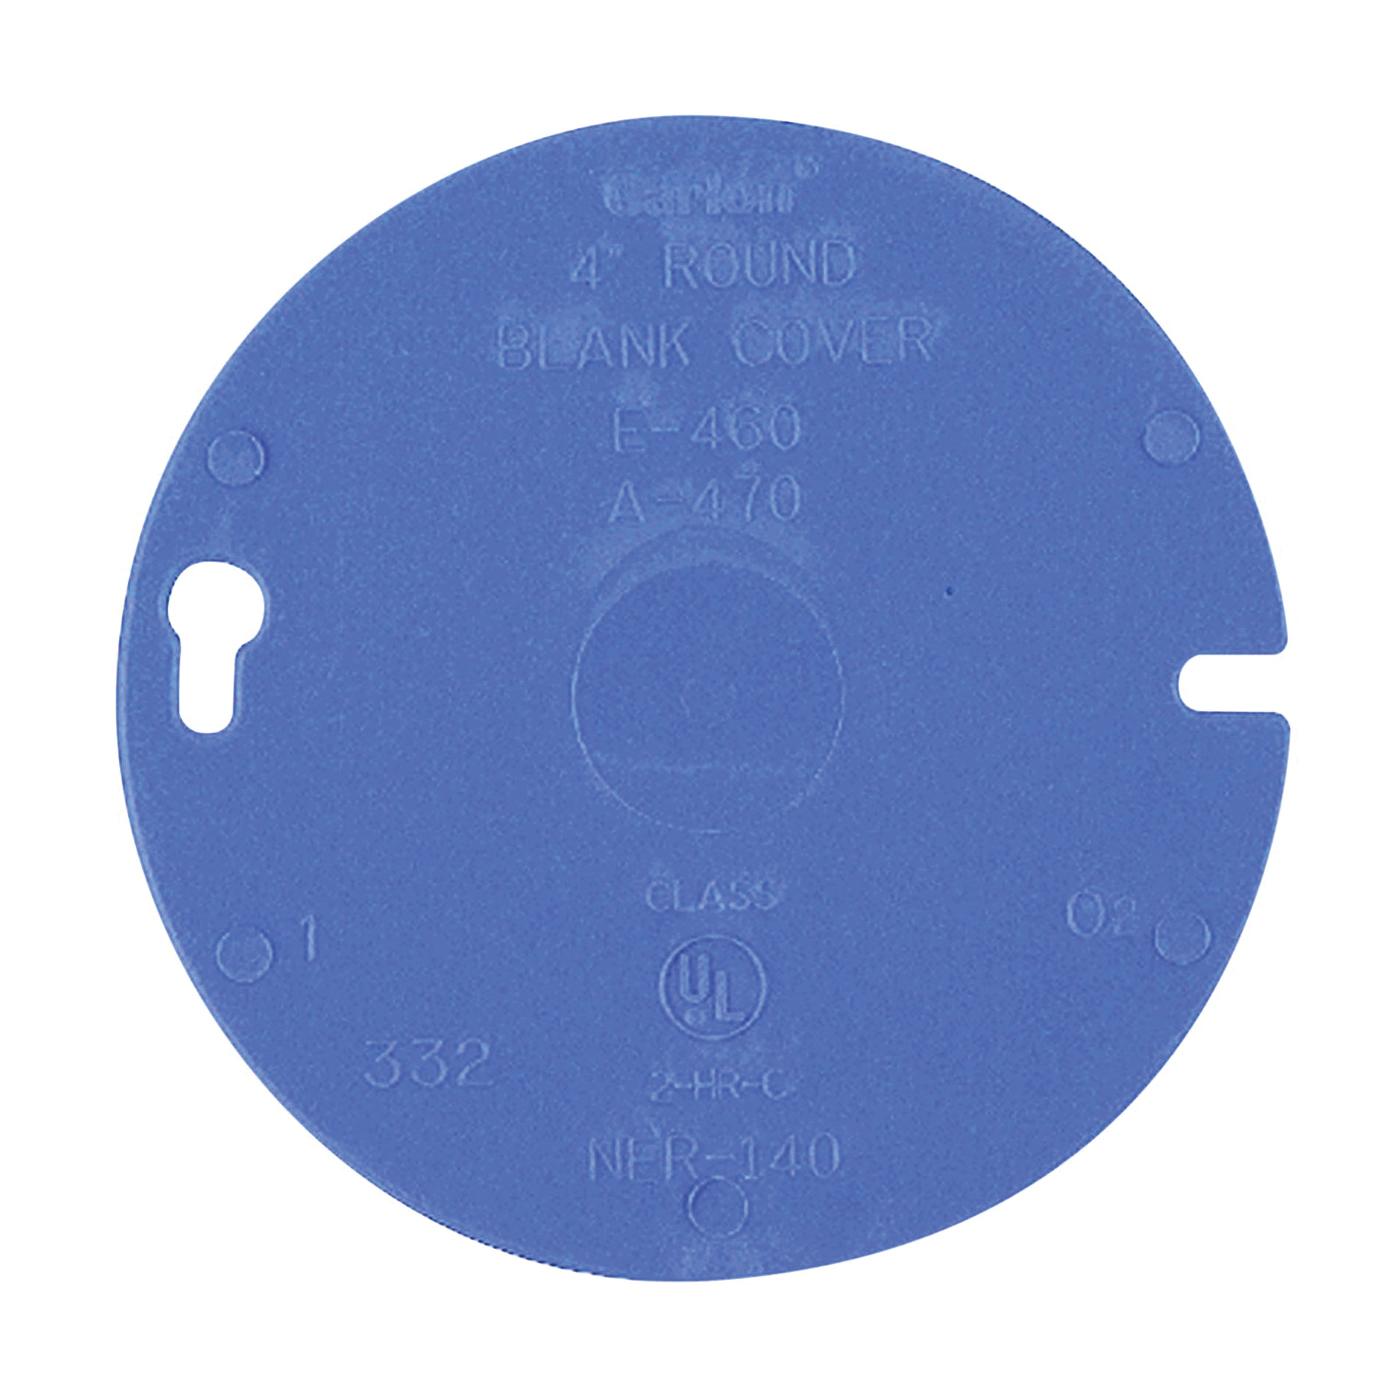 Picture of Carlon E460R-CAR Outlet Box Cover, 4 in Dia, Round, Plastic, Blue